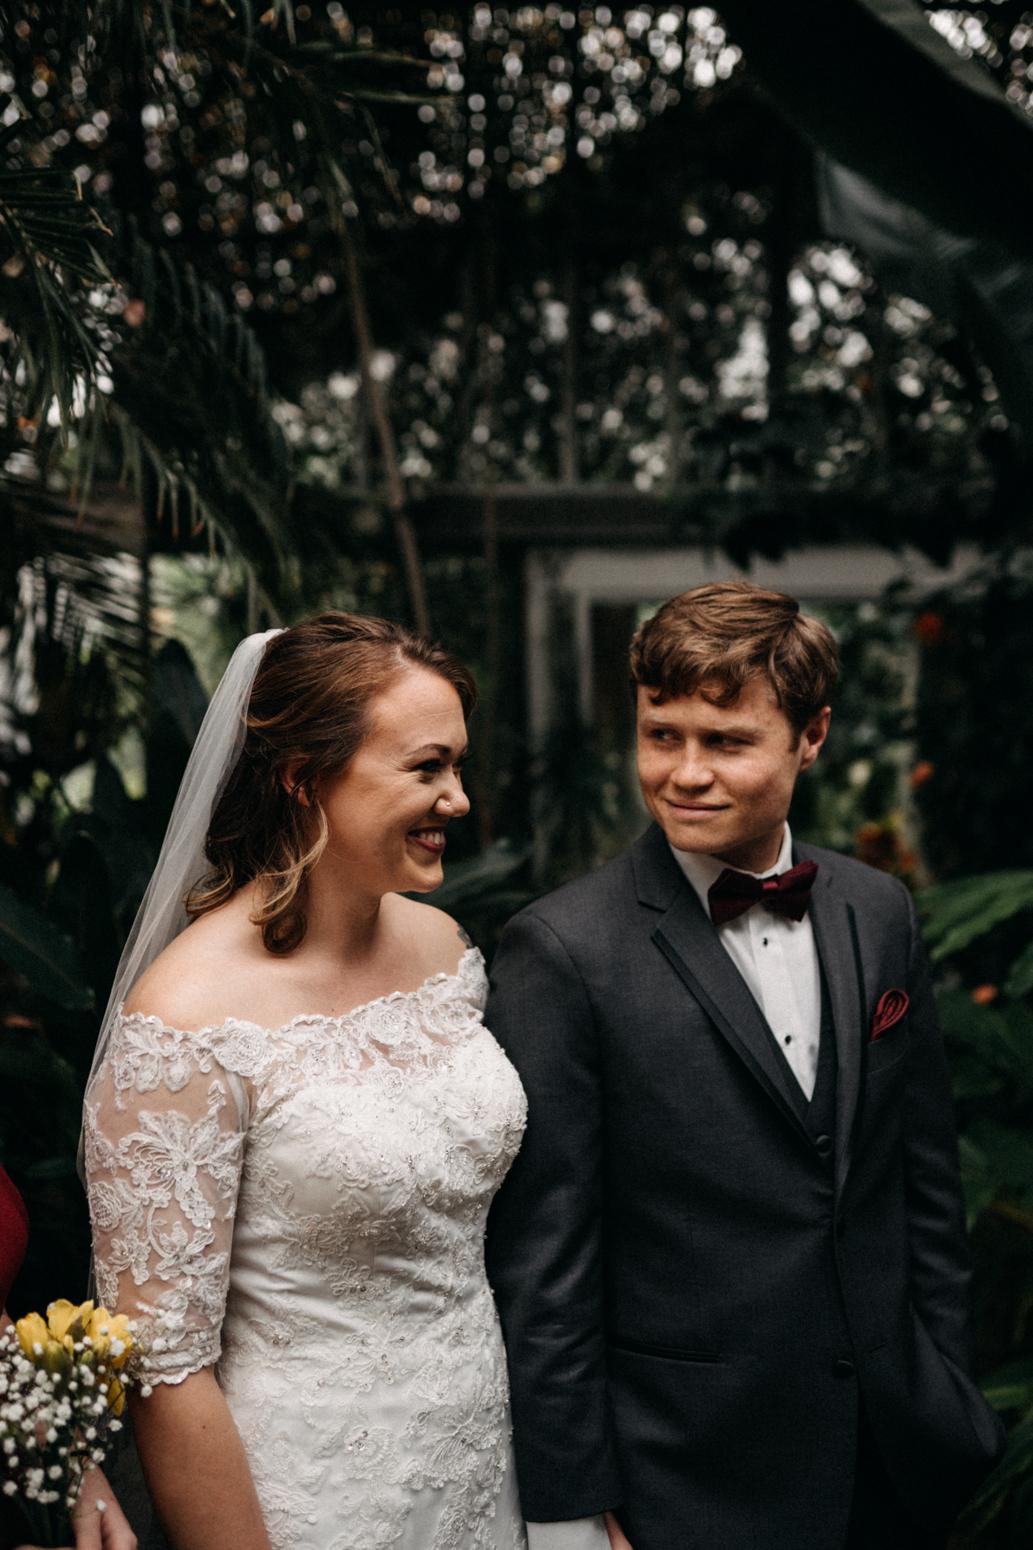 Rochester, NY Wedding Photographer (36 of 96).JPG